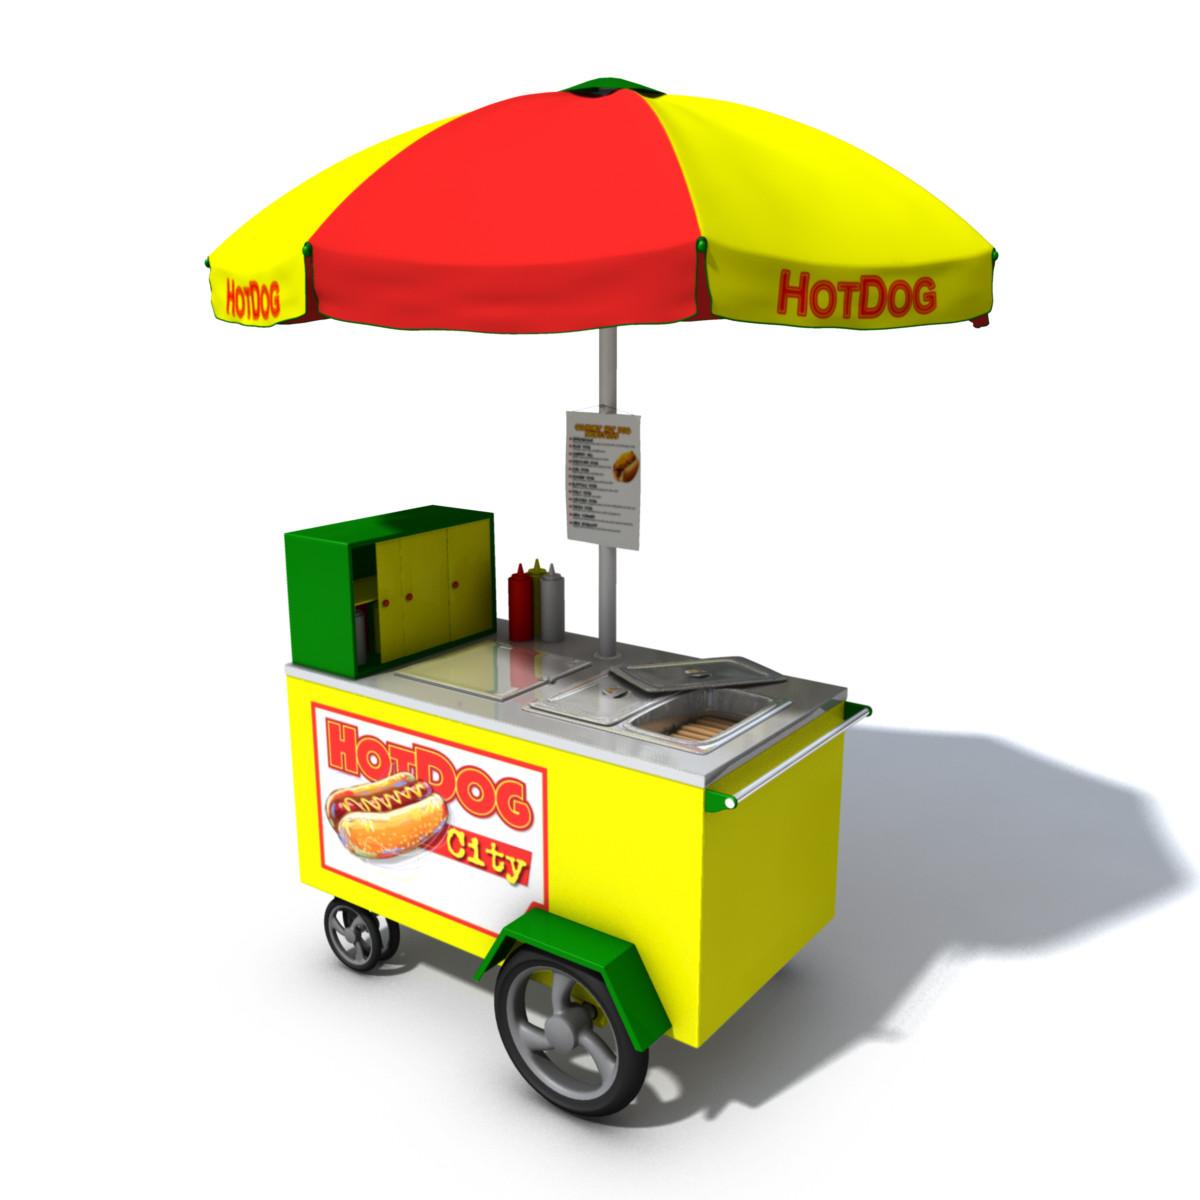 Best Hot Dog Stands